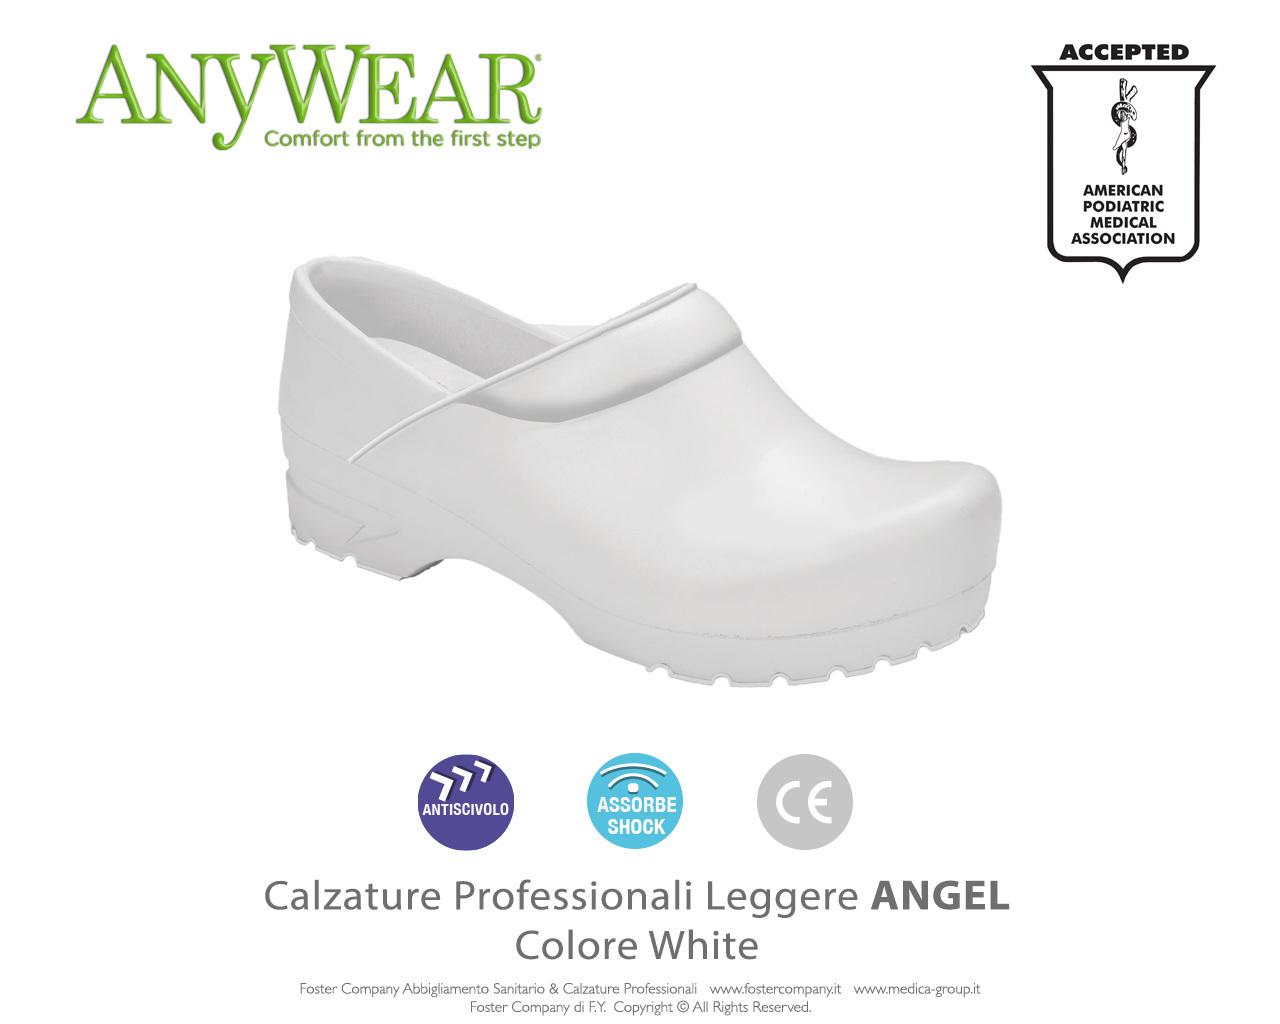 Calzature Professionali Anywear Guardian ANGEL Colore White